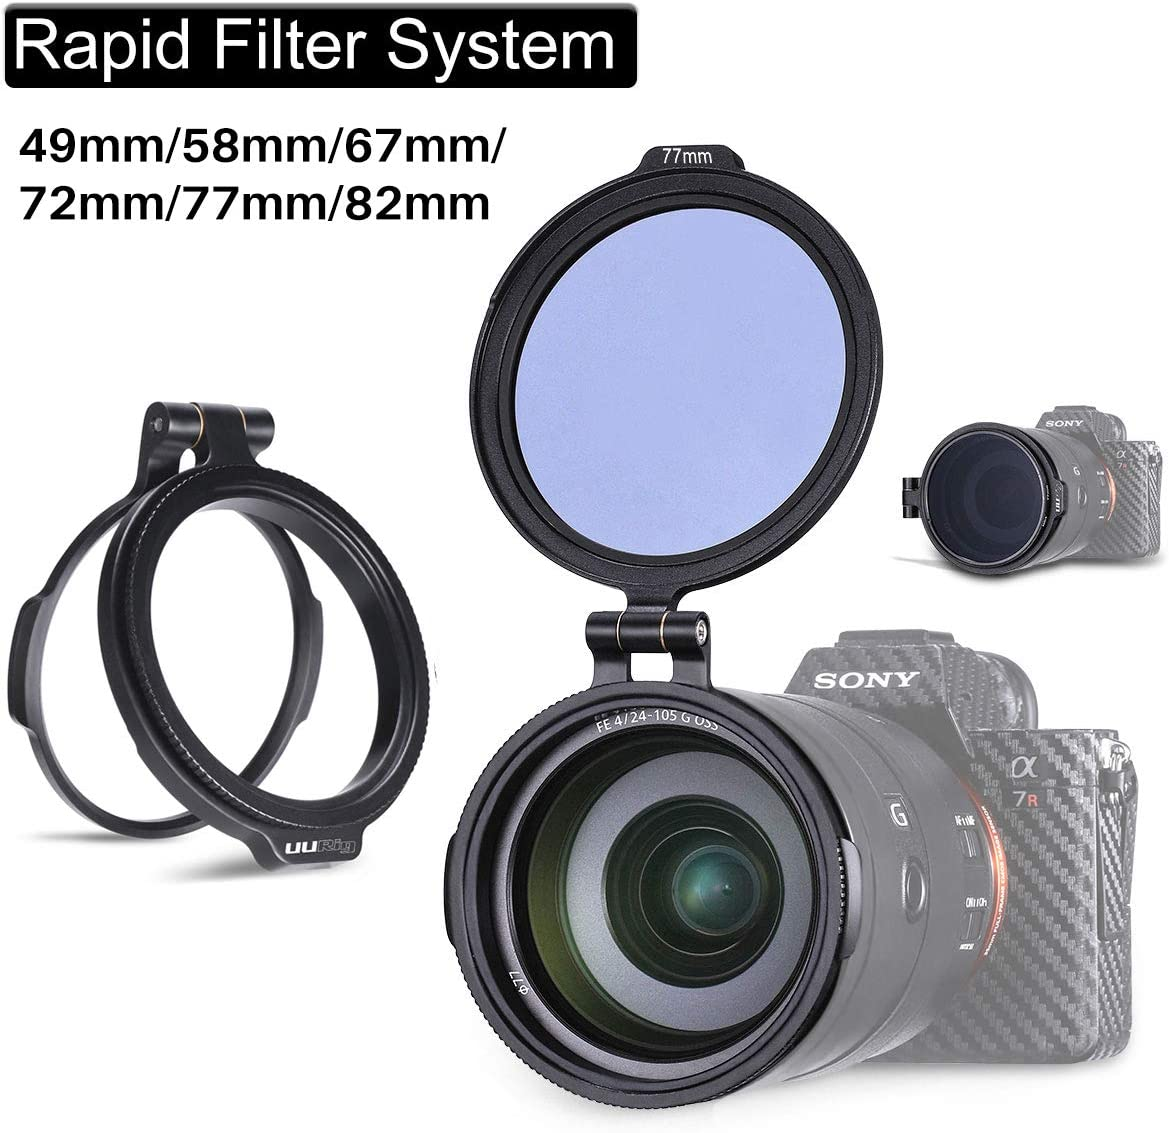 Yifant 67MM Aluminum Rapid Camera Lens ND Filter Exchange Mount Bracket Quick Release Filter Adapter Ring Exchange System for 67MM Filter